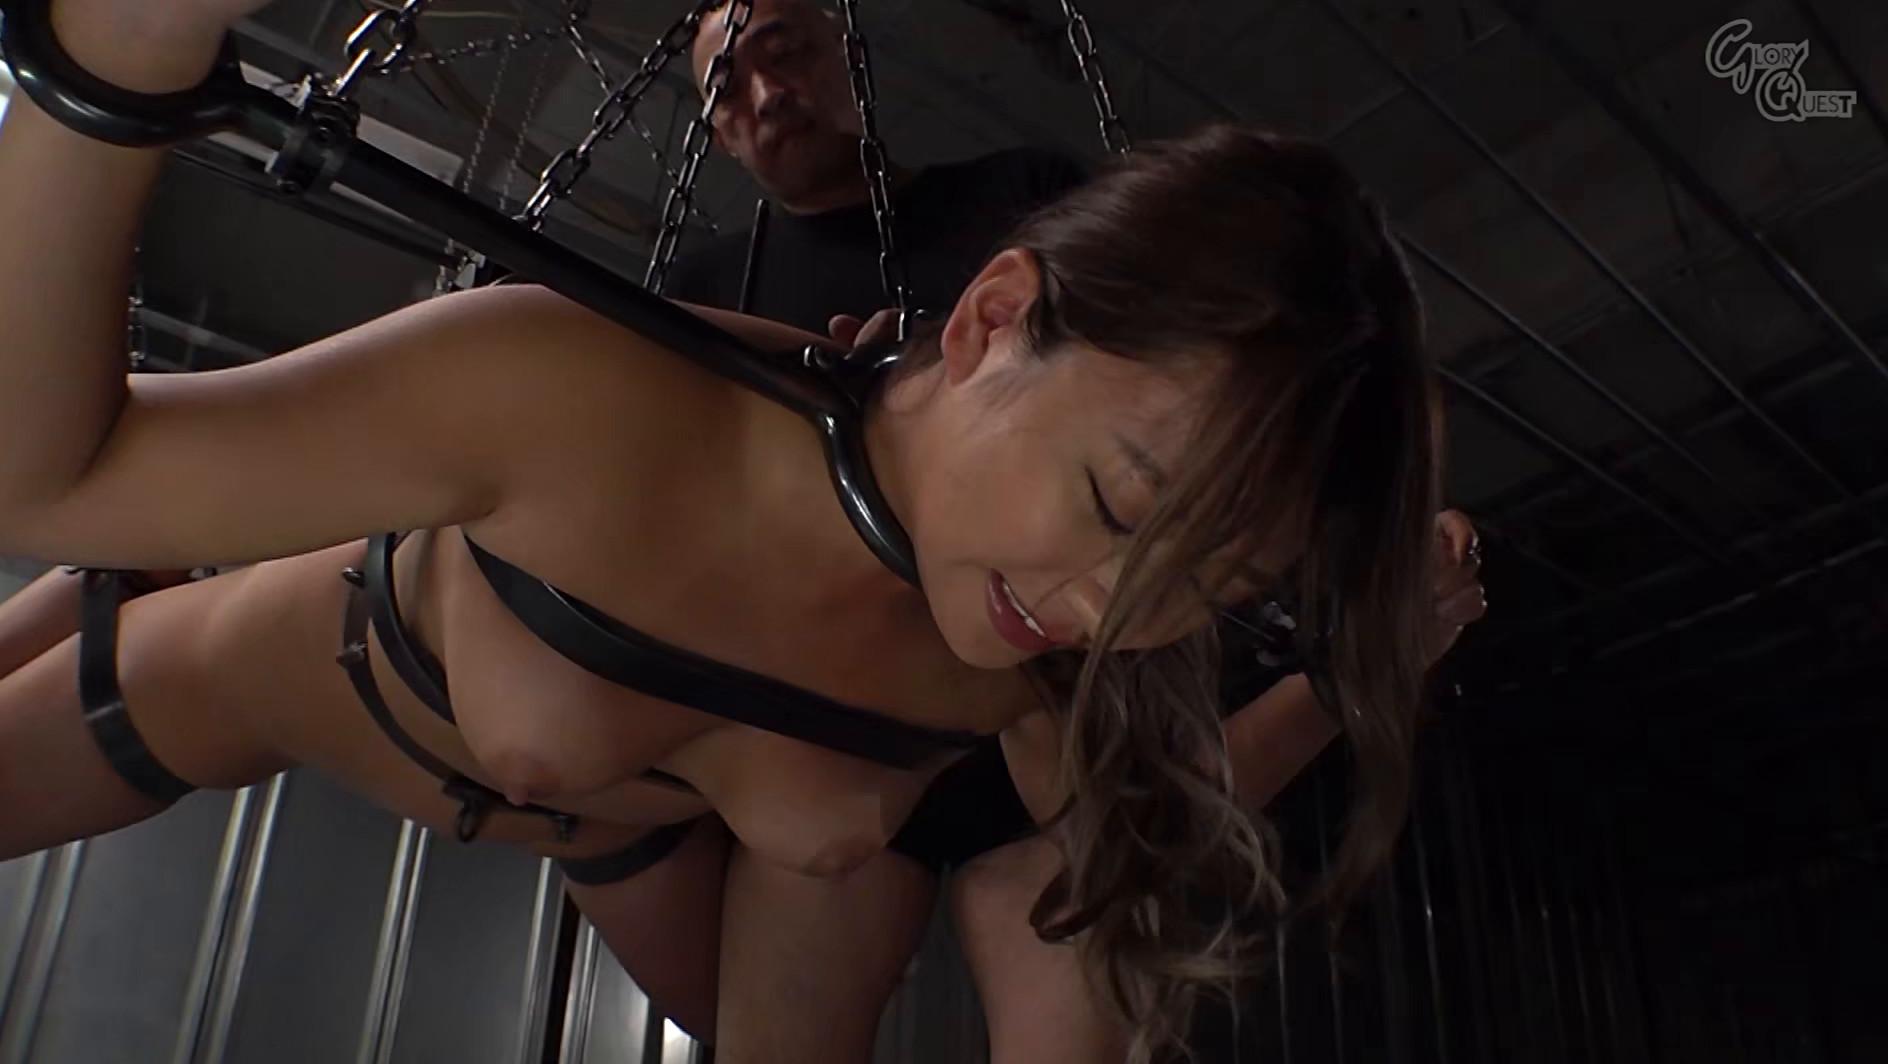 Ma○ko Device Bondage 17 鉄拘束マ○コ拷問 今井夏帆9